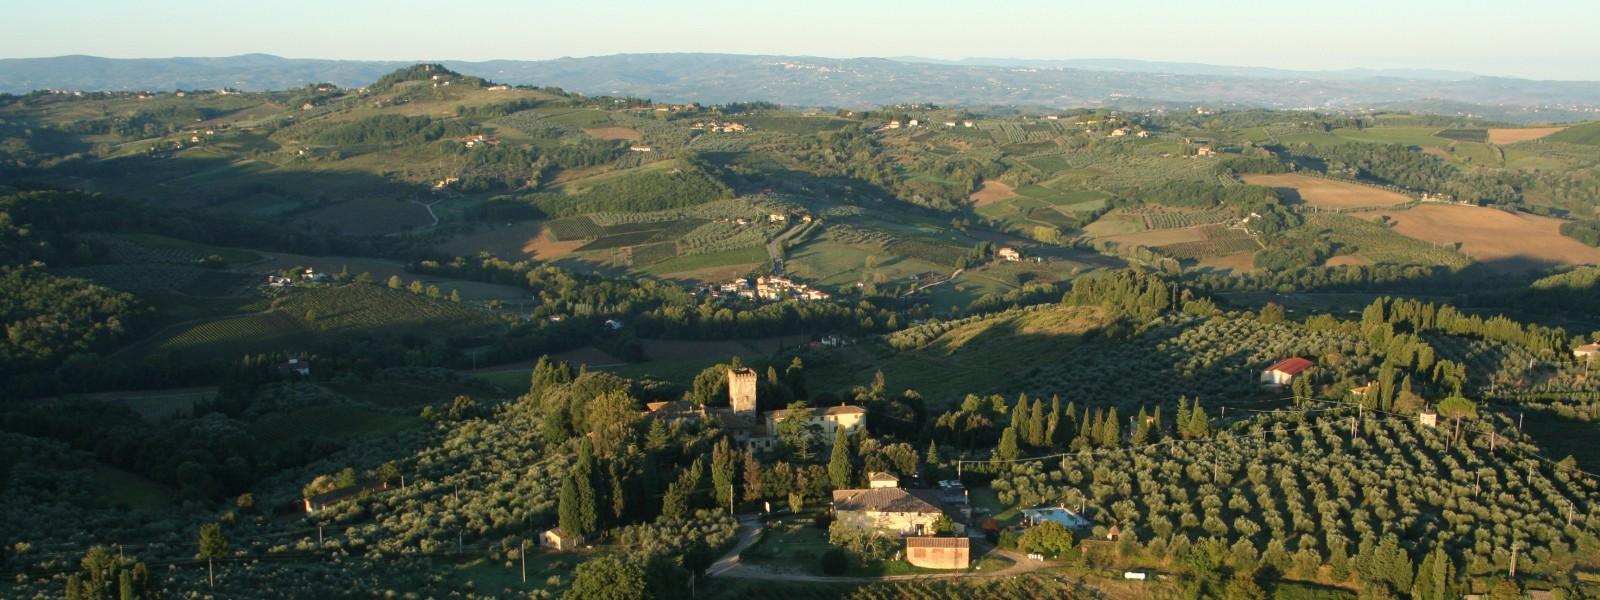 Experience hot air ballooning over Tuscany